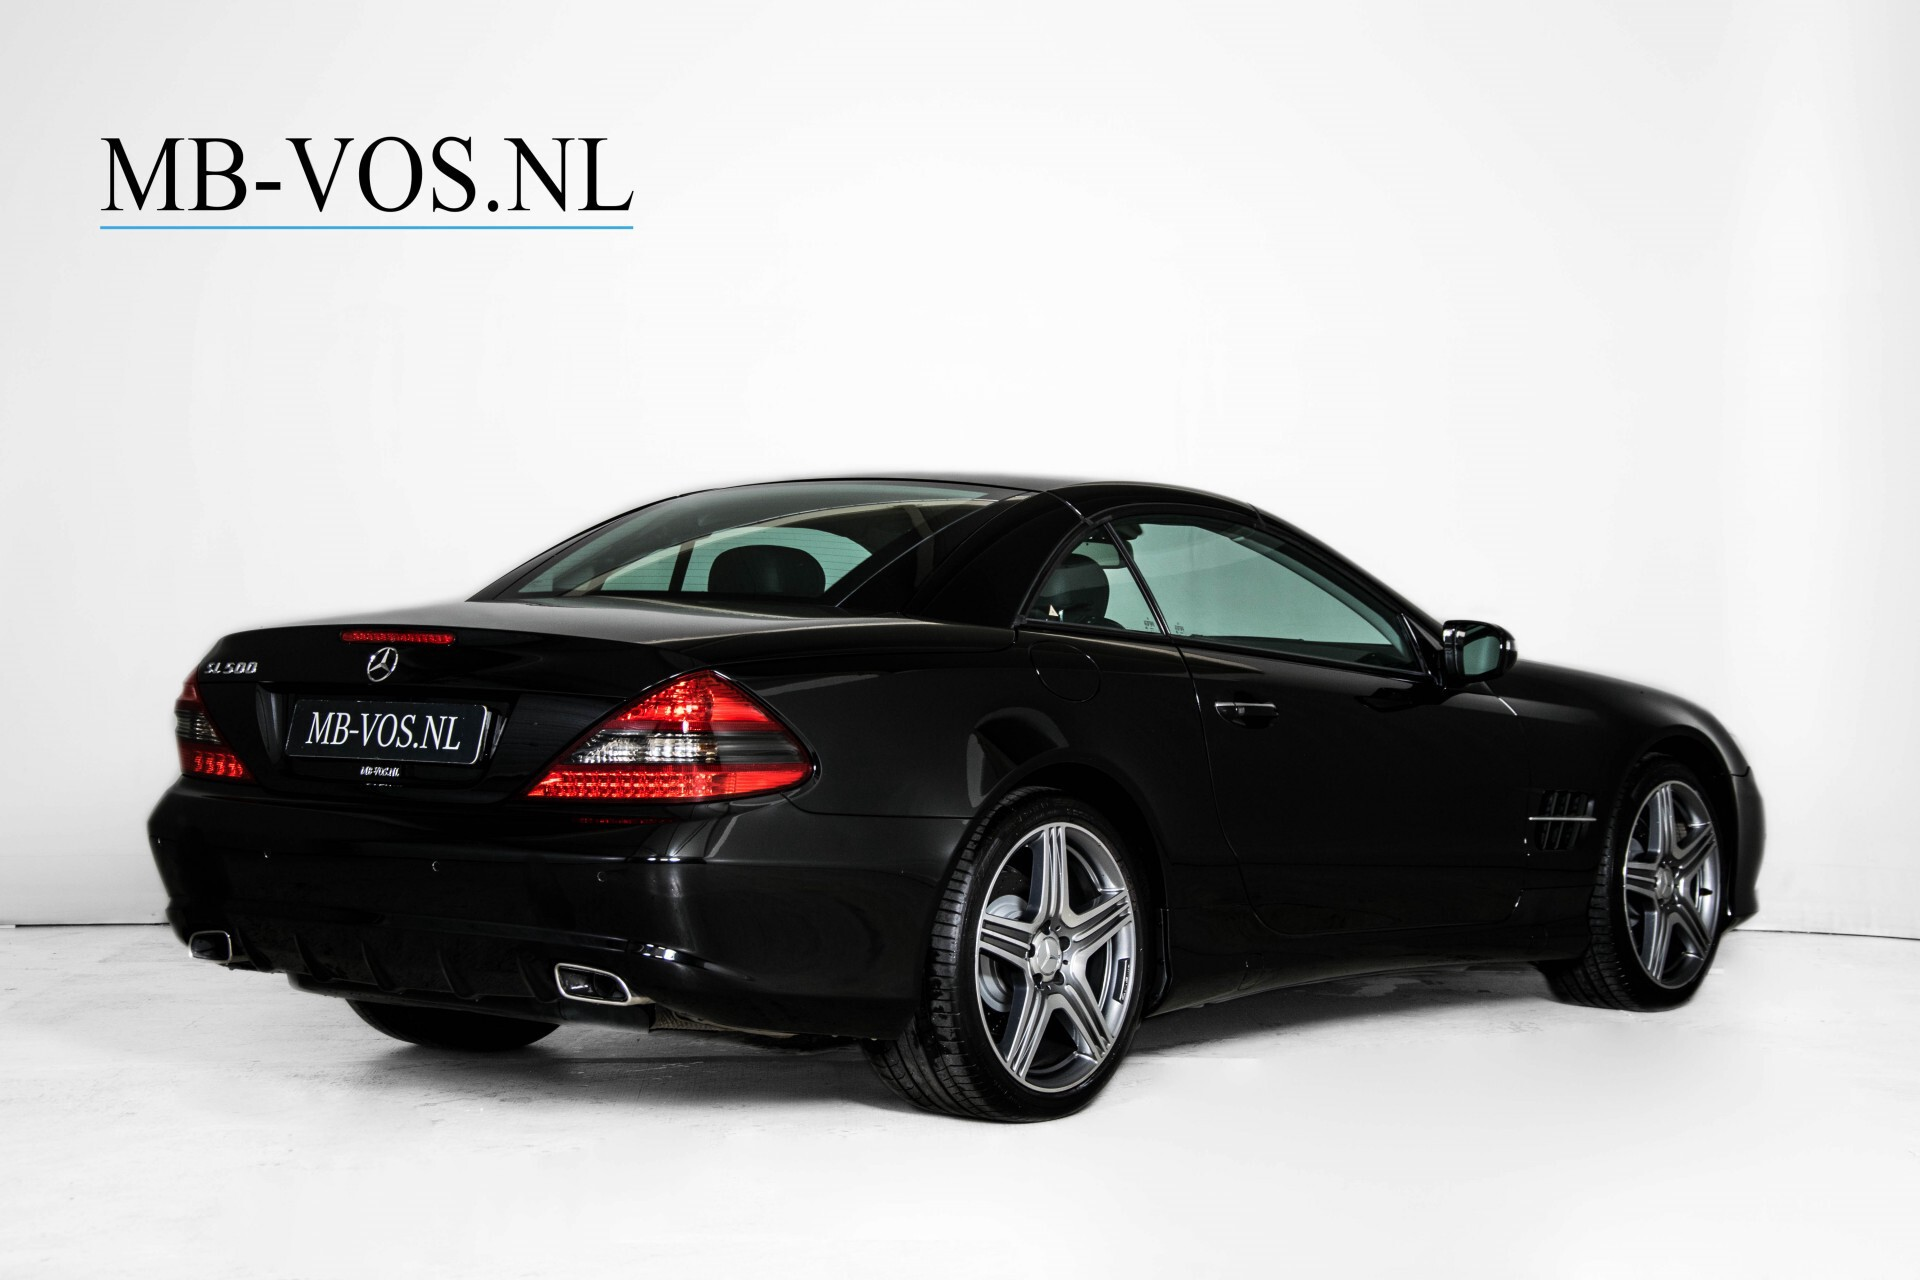 Mercedes-Benz SL-Klasse 500 Sport ABC/Harman-Kardon/Comand/Distronic Aut7 NP €175292 Foto 4